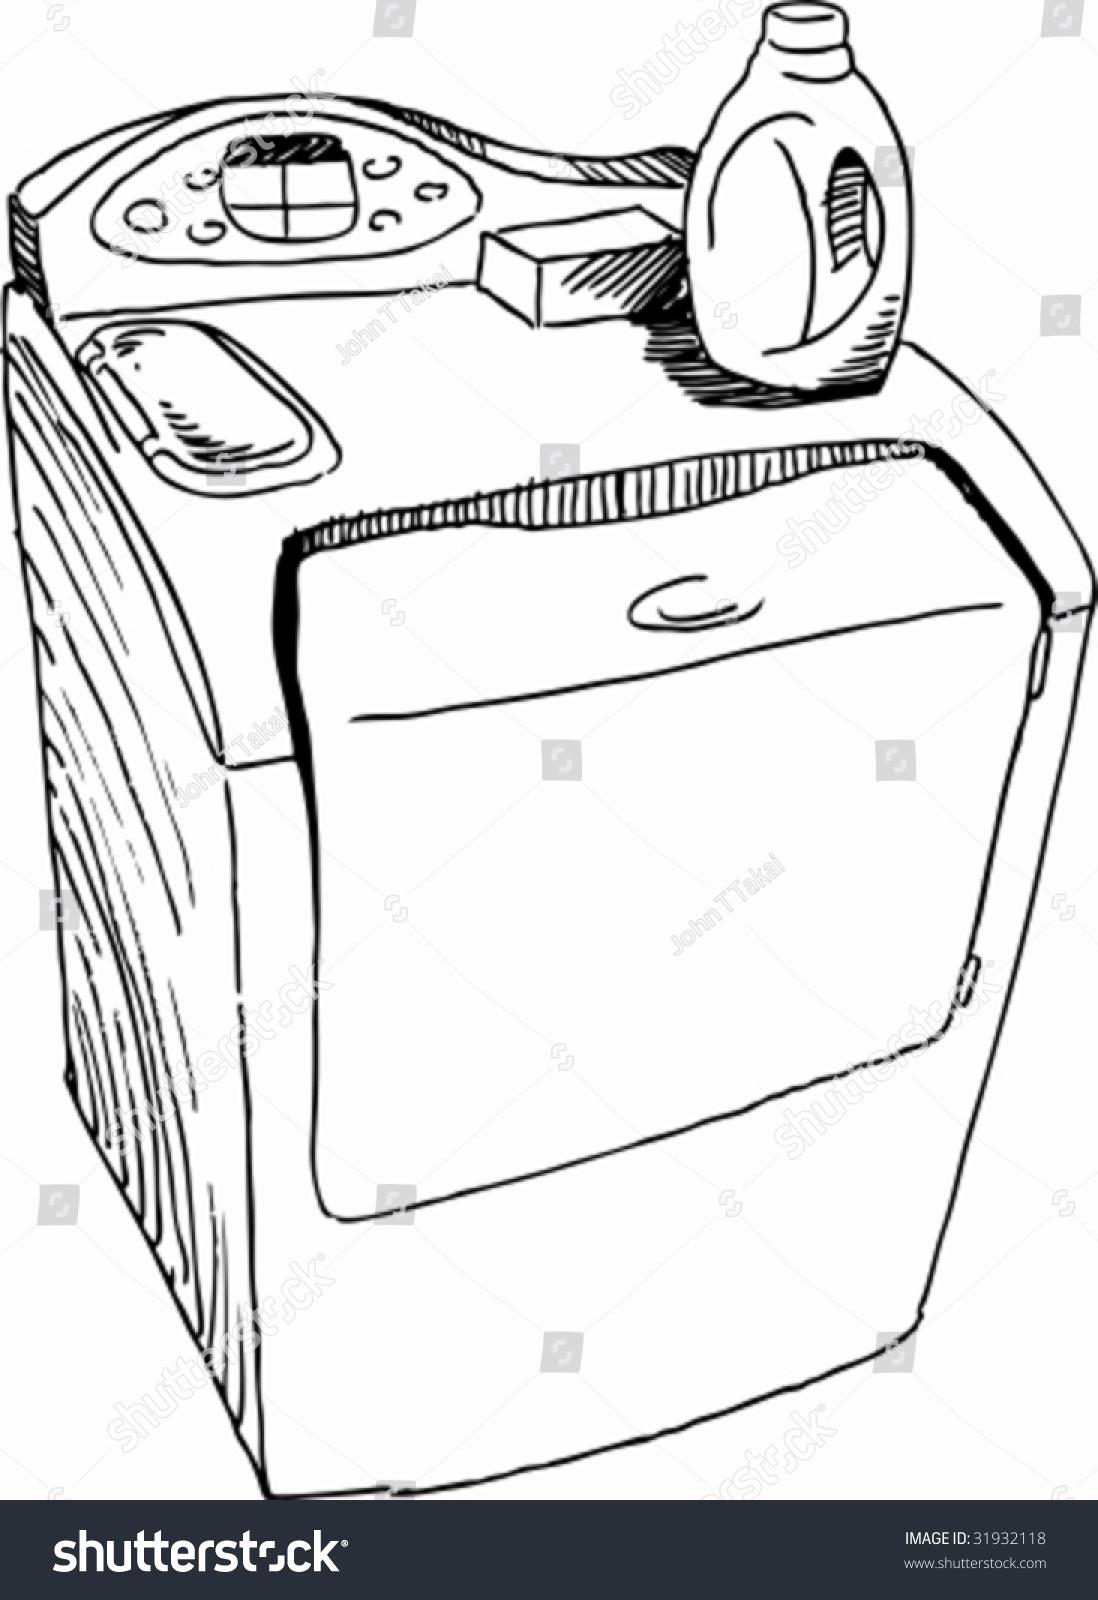 Washing Machine Drawing ~ Washing machine drawing stock vector illustration